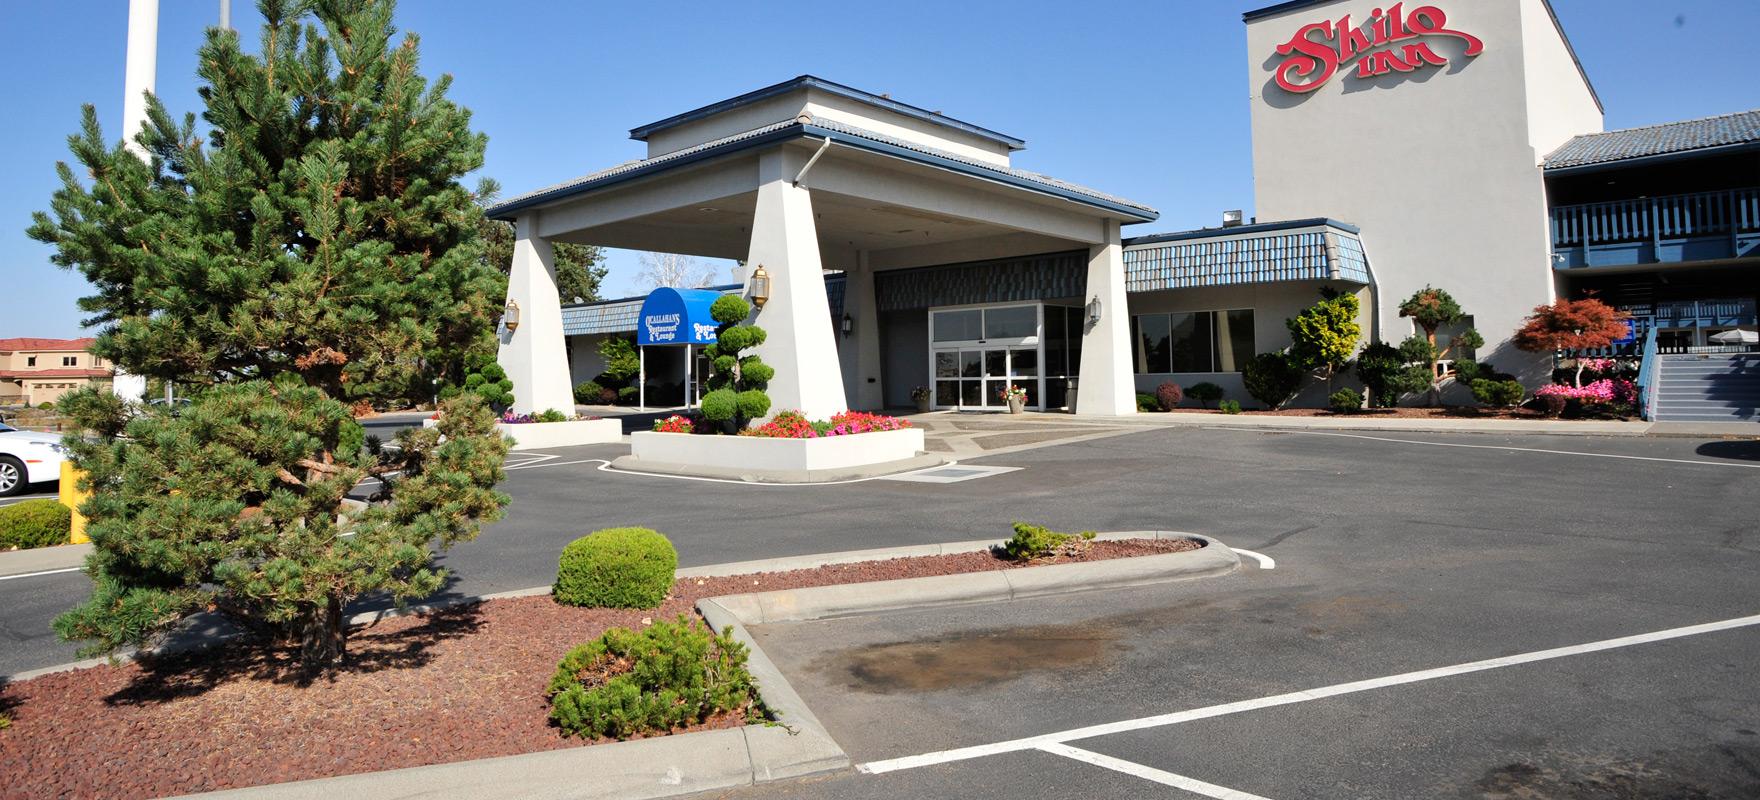 Shilo Inns Suites Hotels Richland Washington